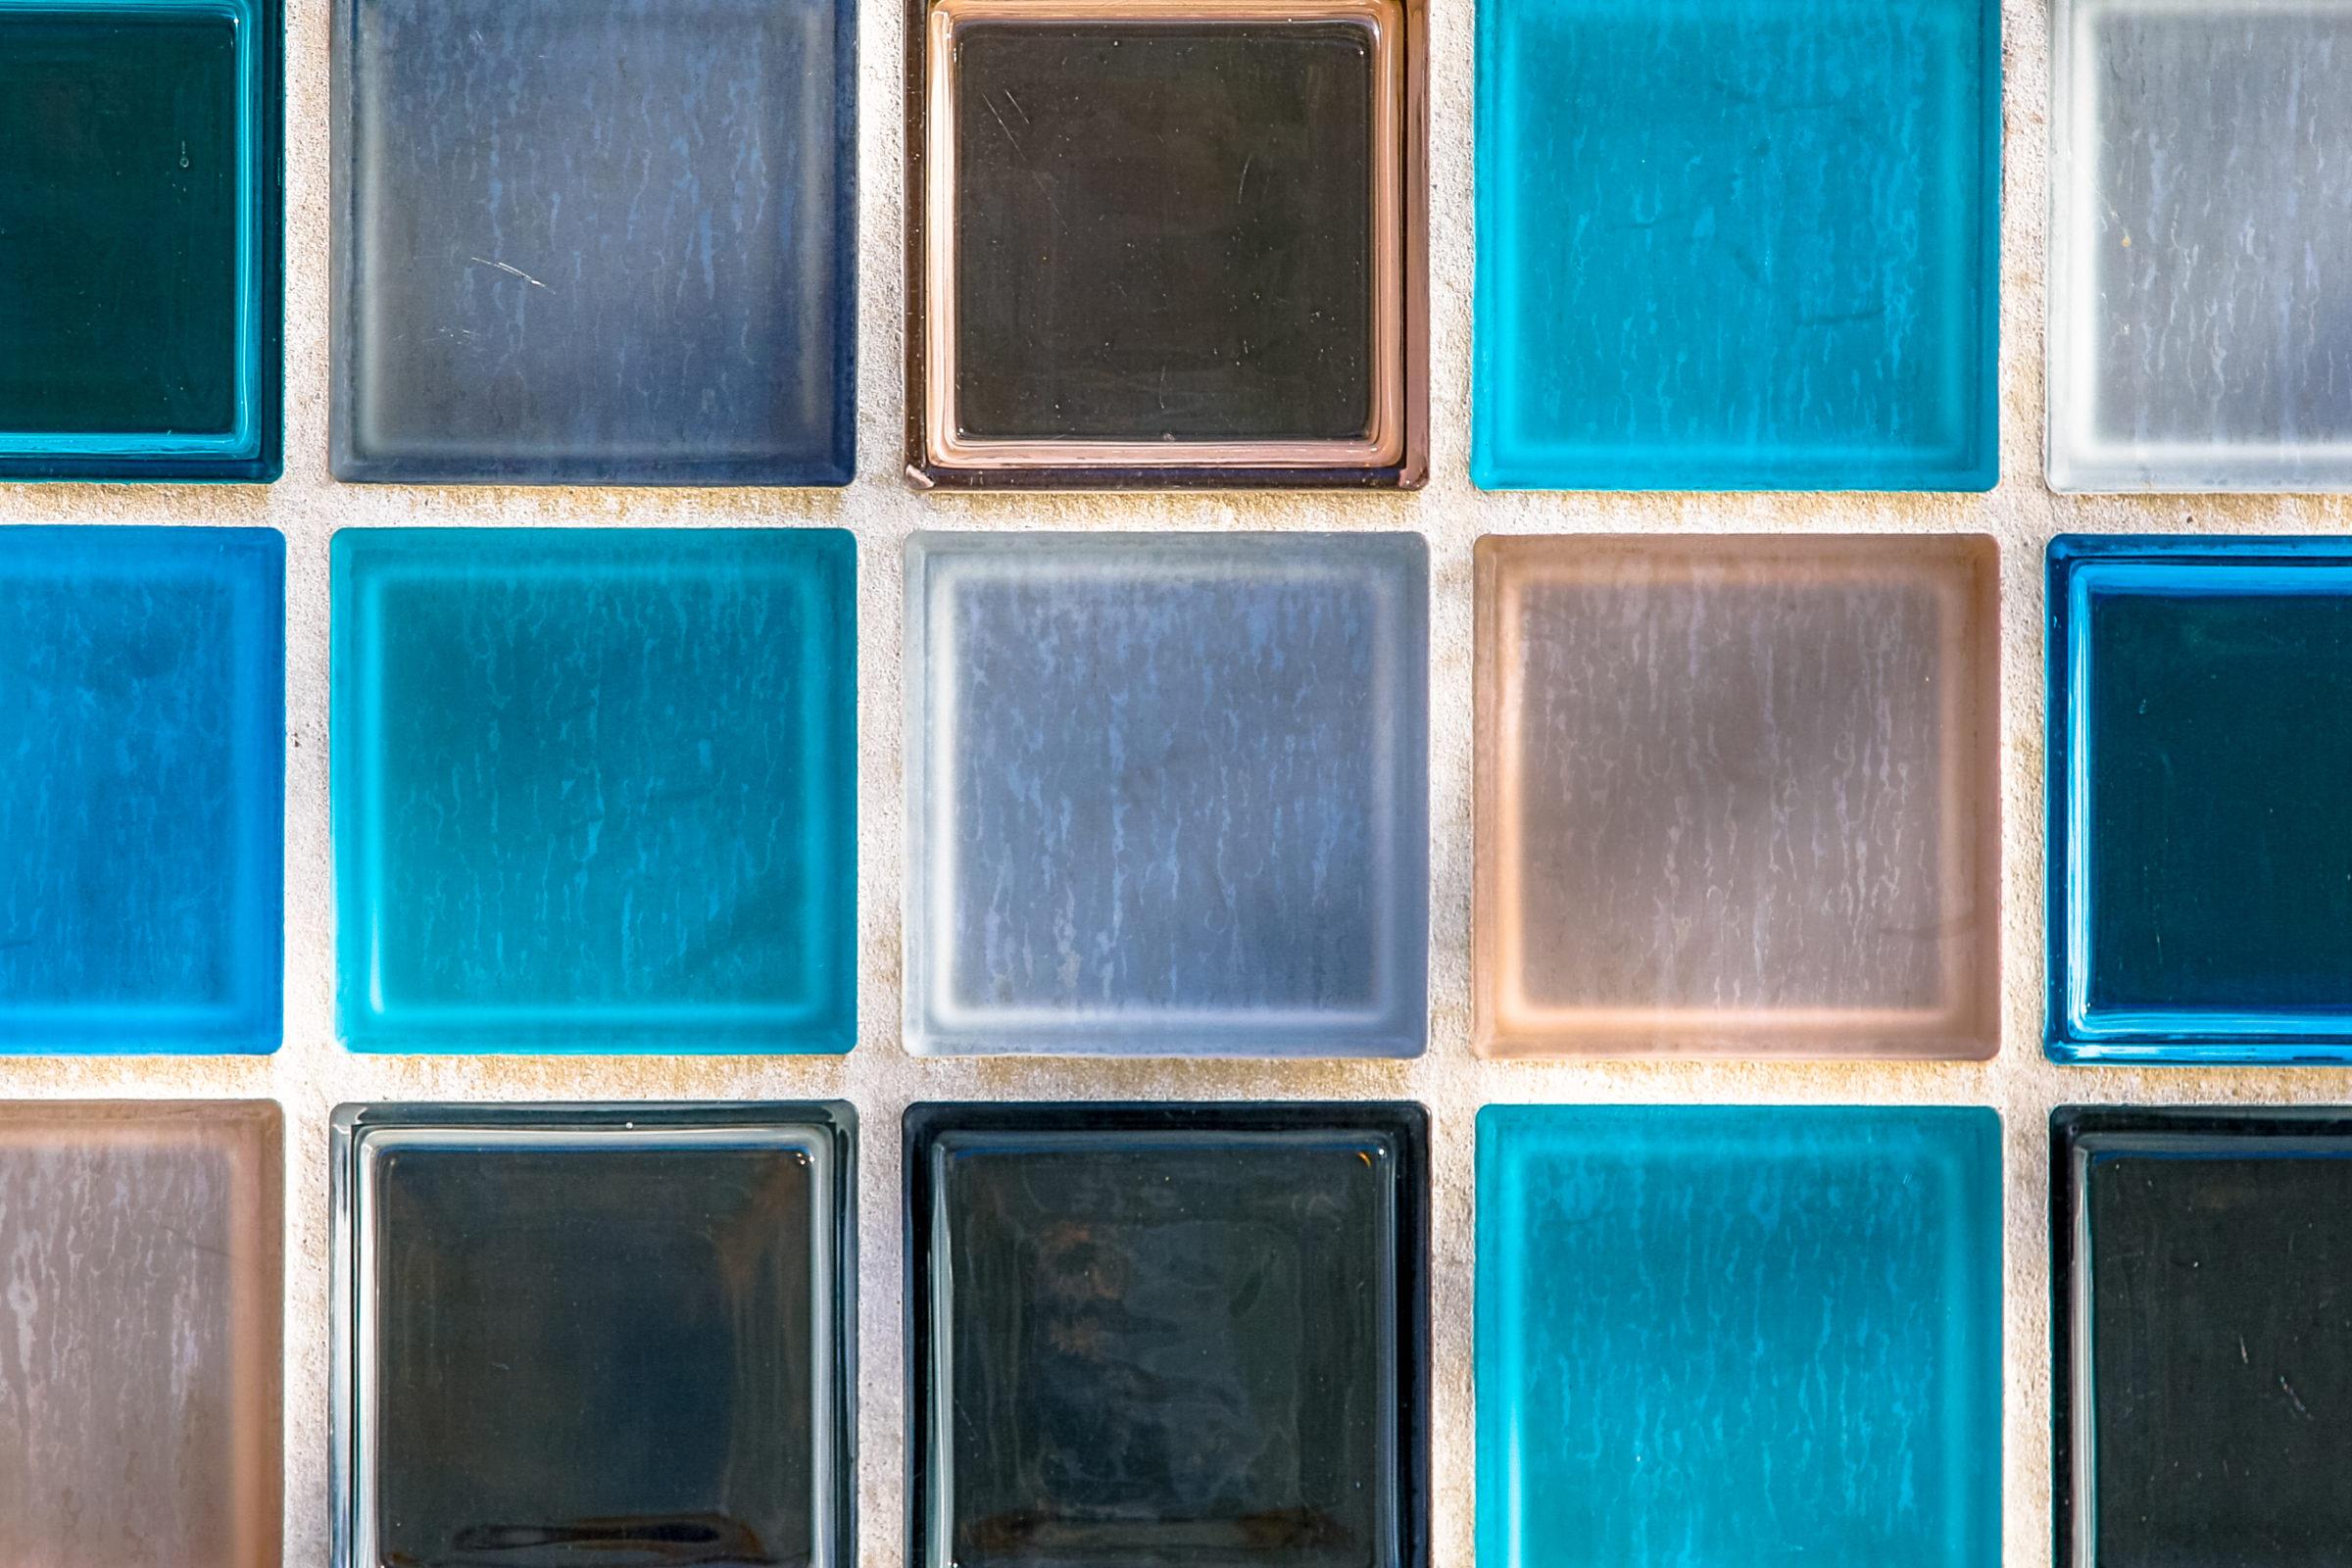 wallpaper image of transparant glass tiles PE56VKB